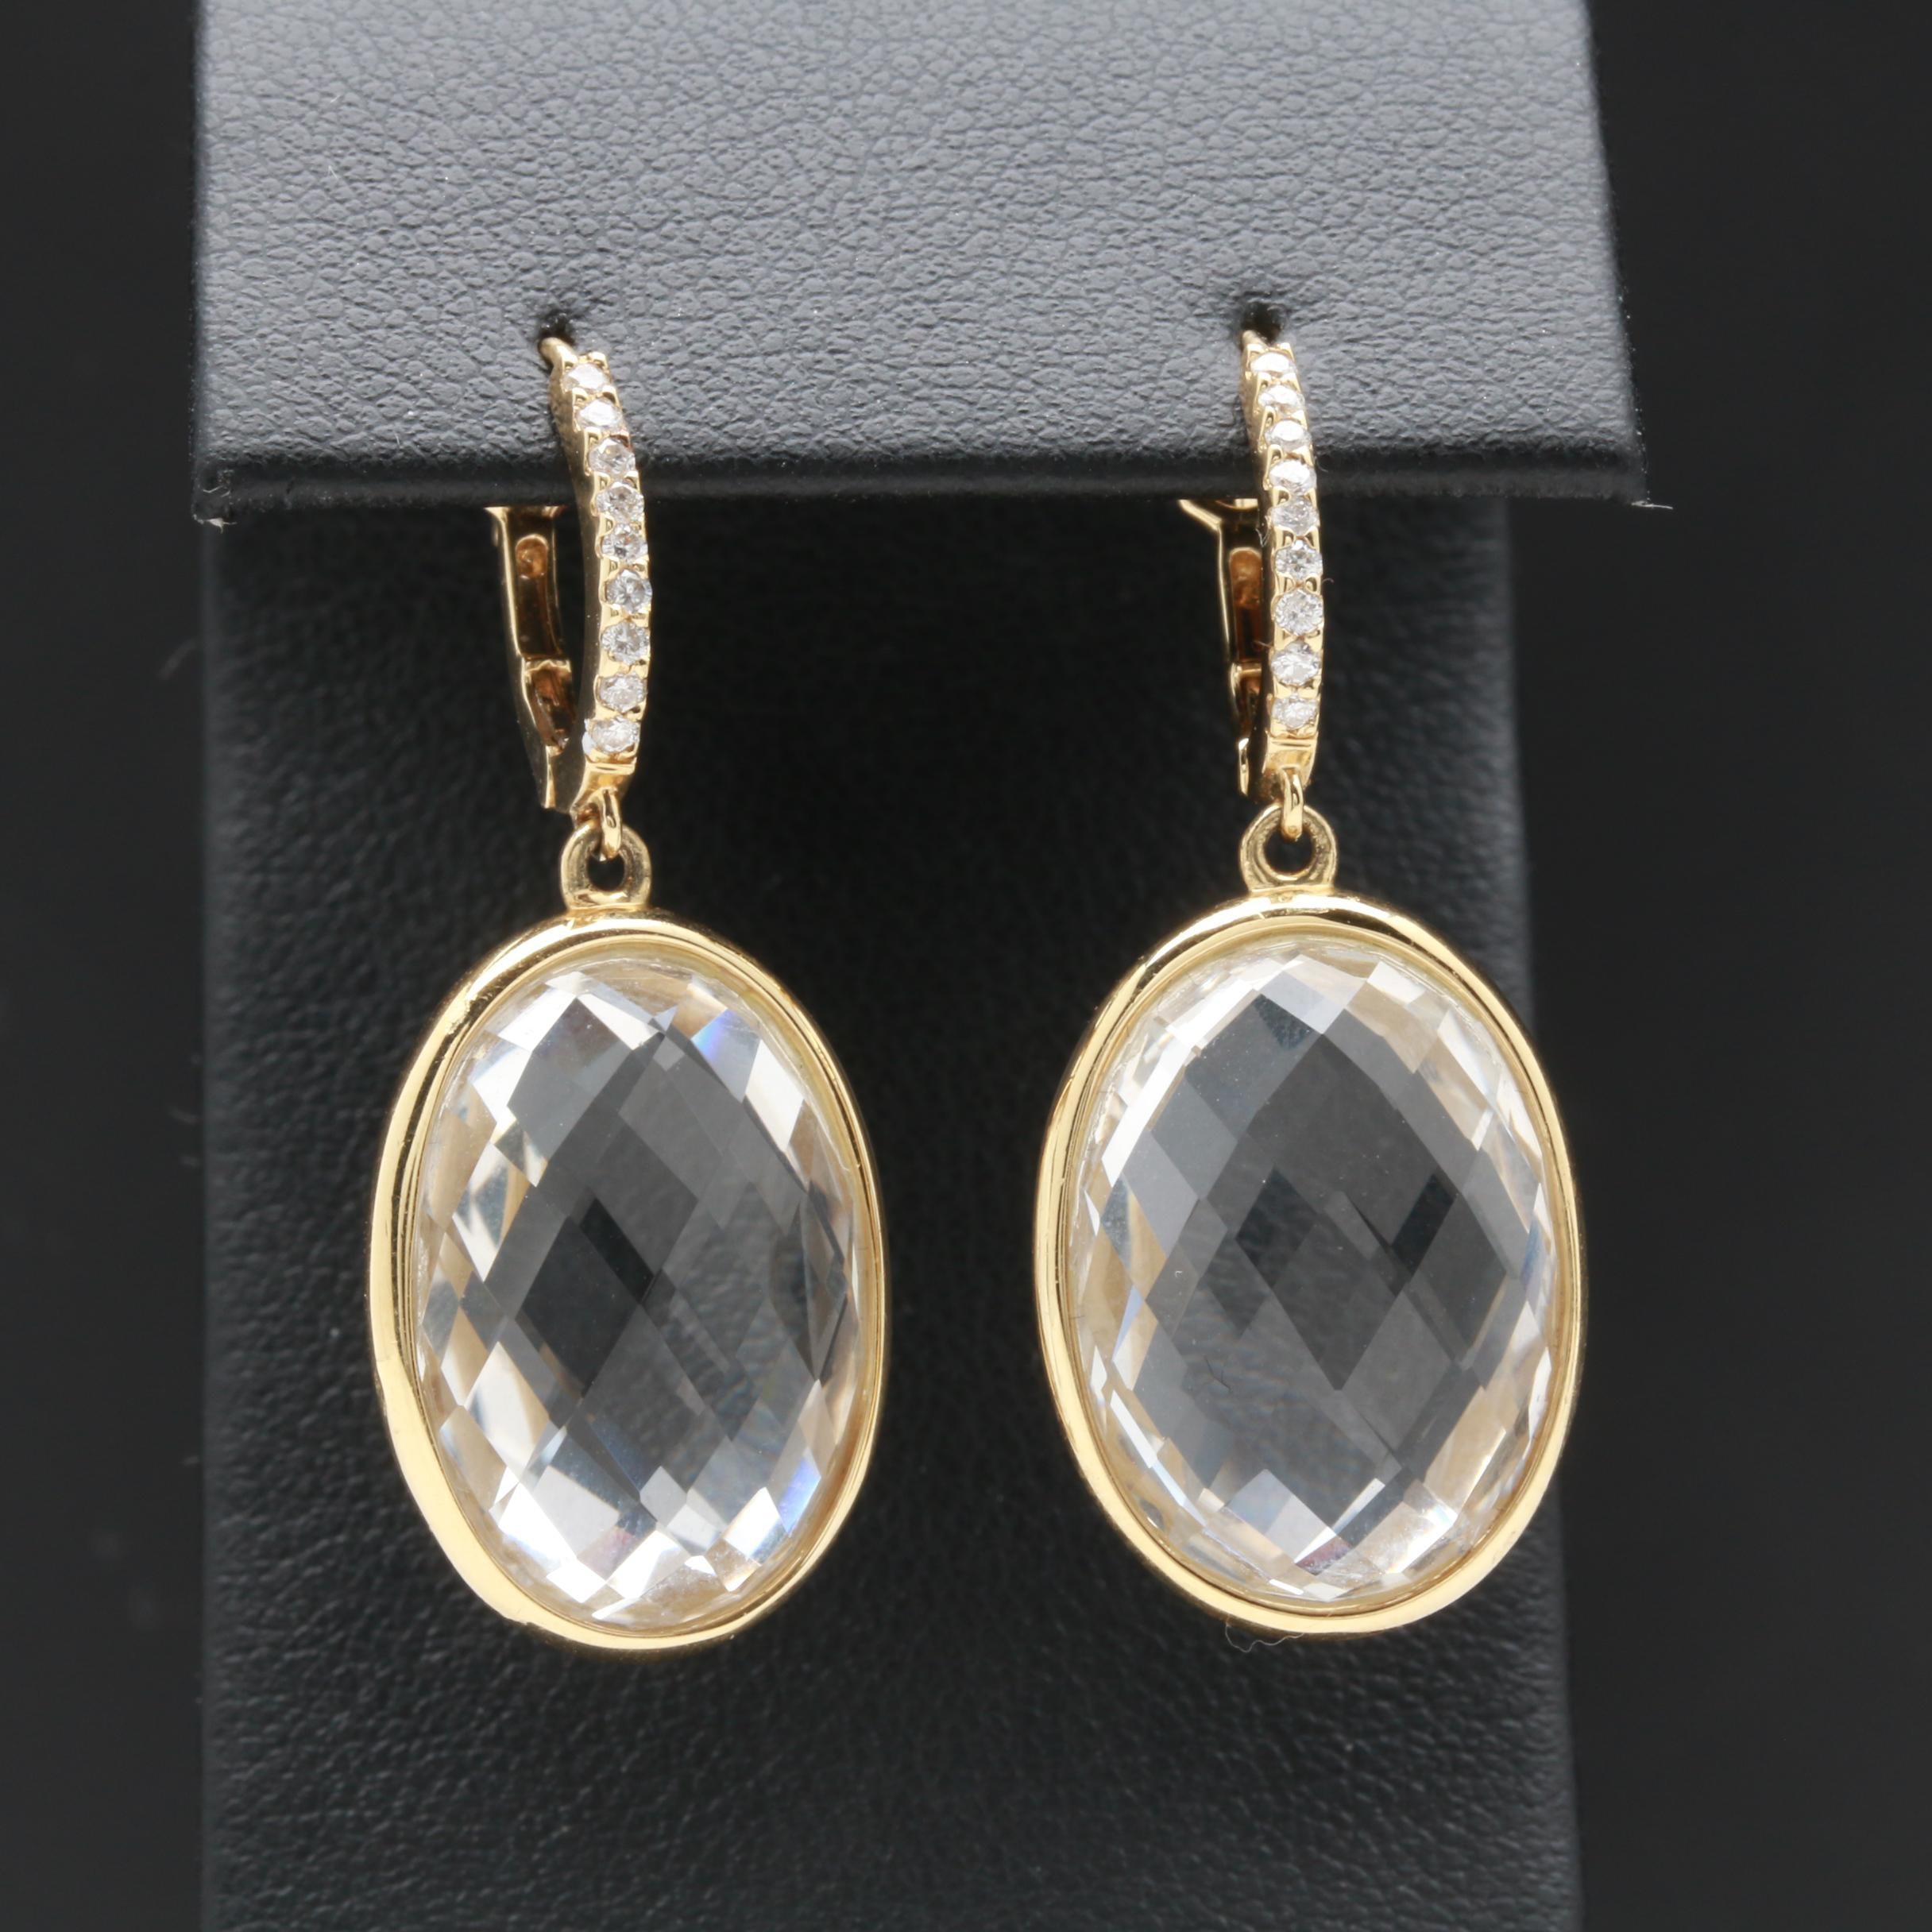 14K Yellow Gold Quartz and Diamond Earrings